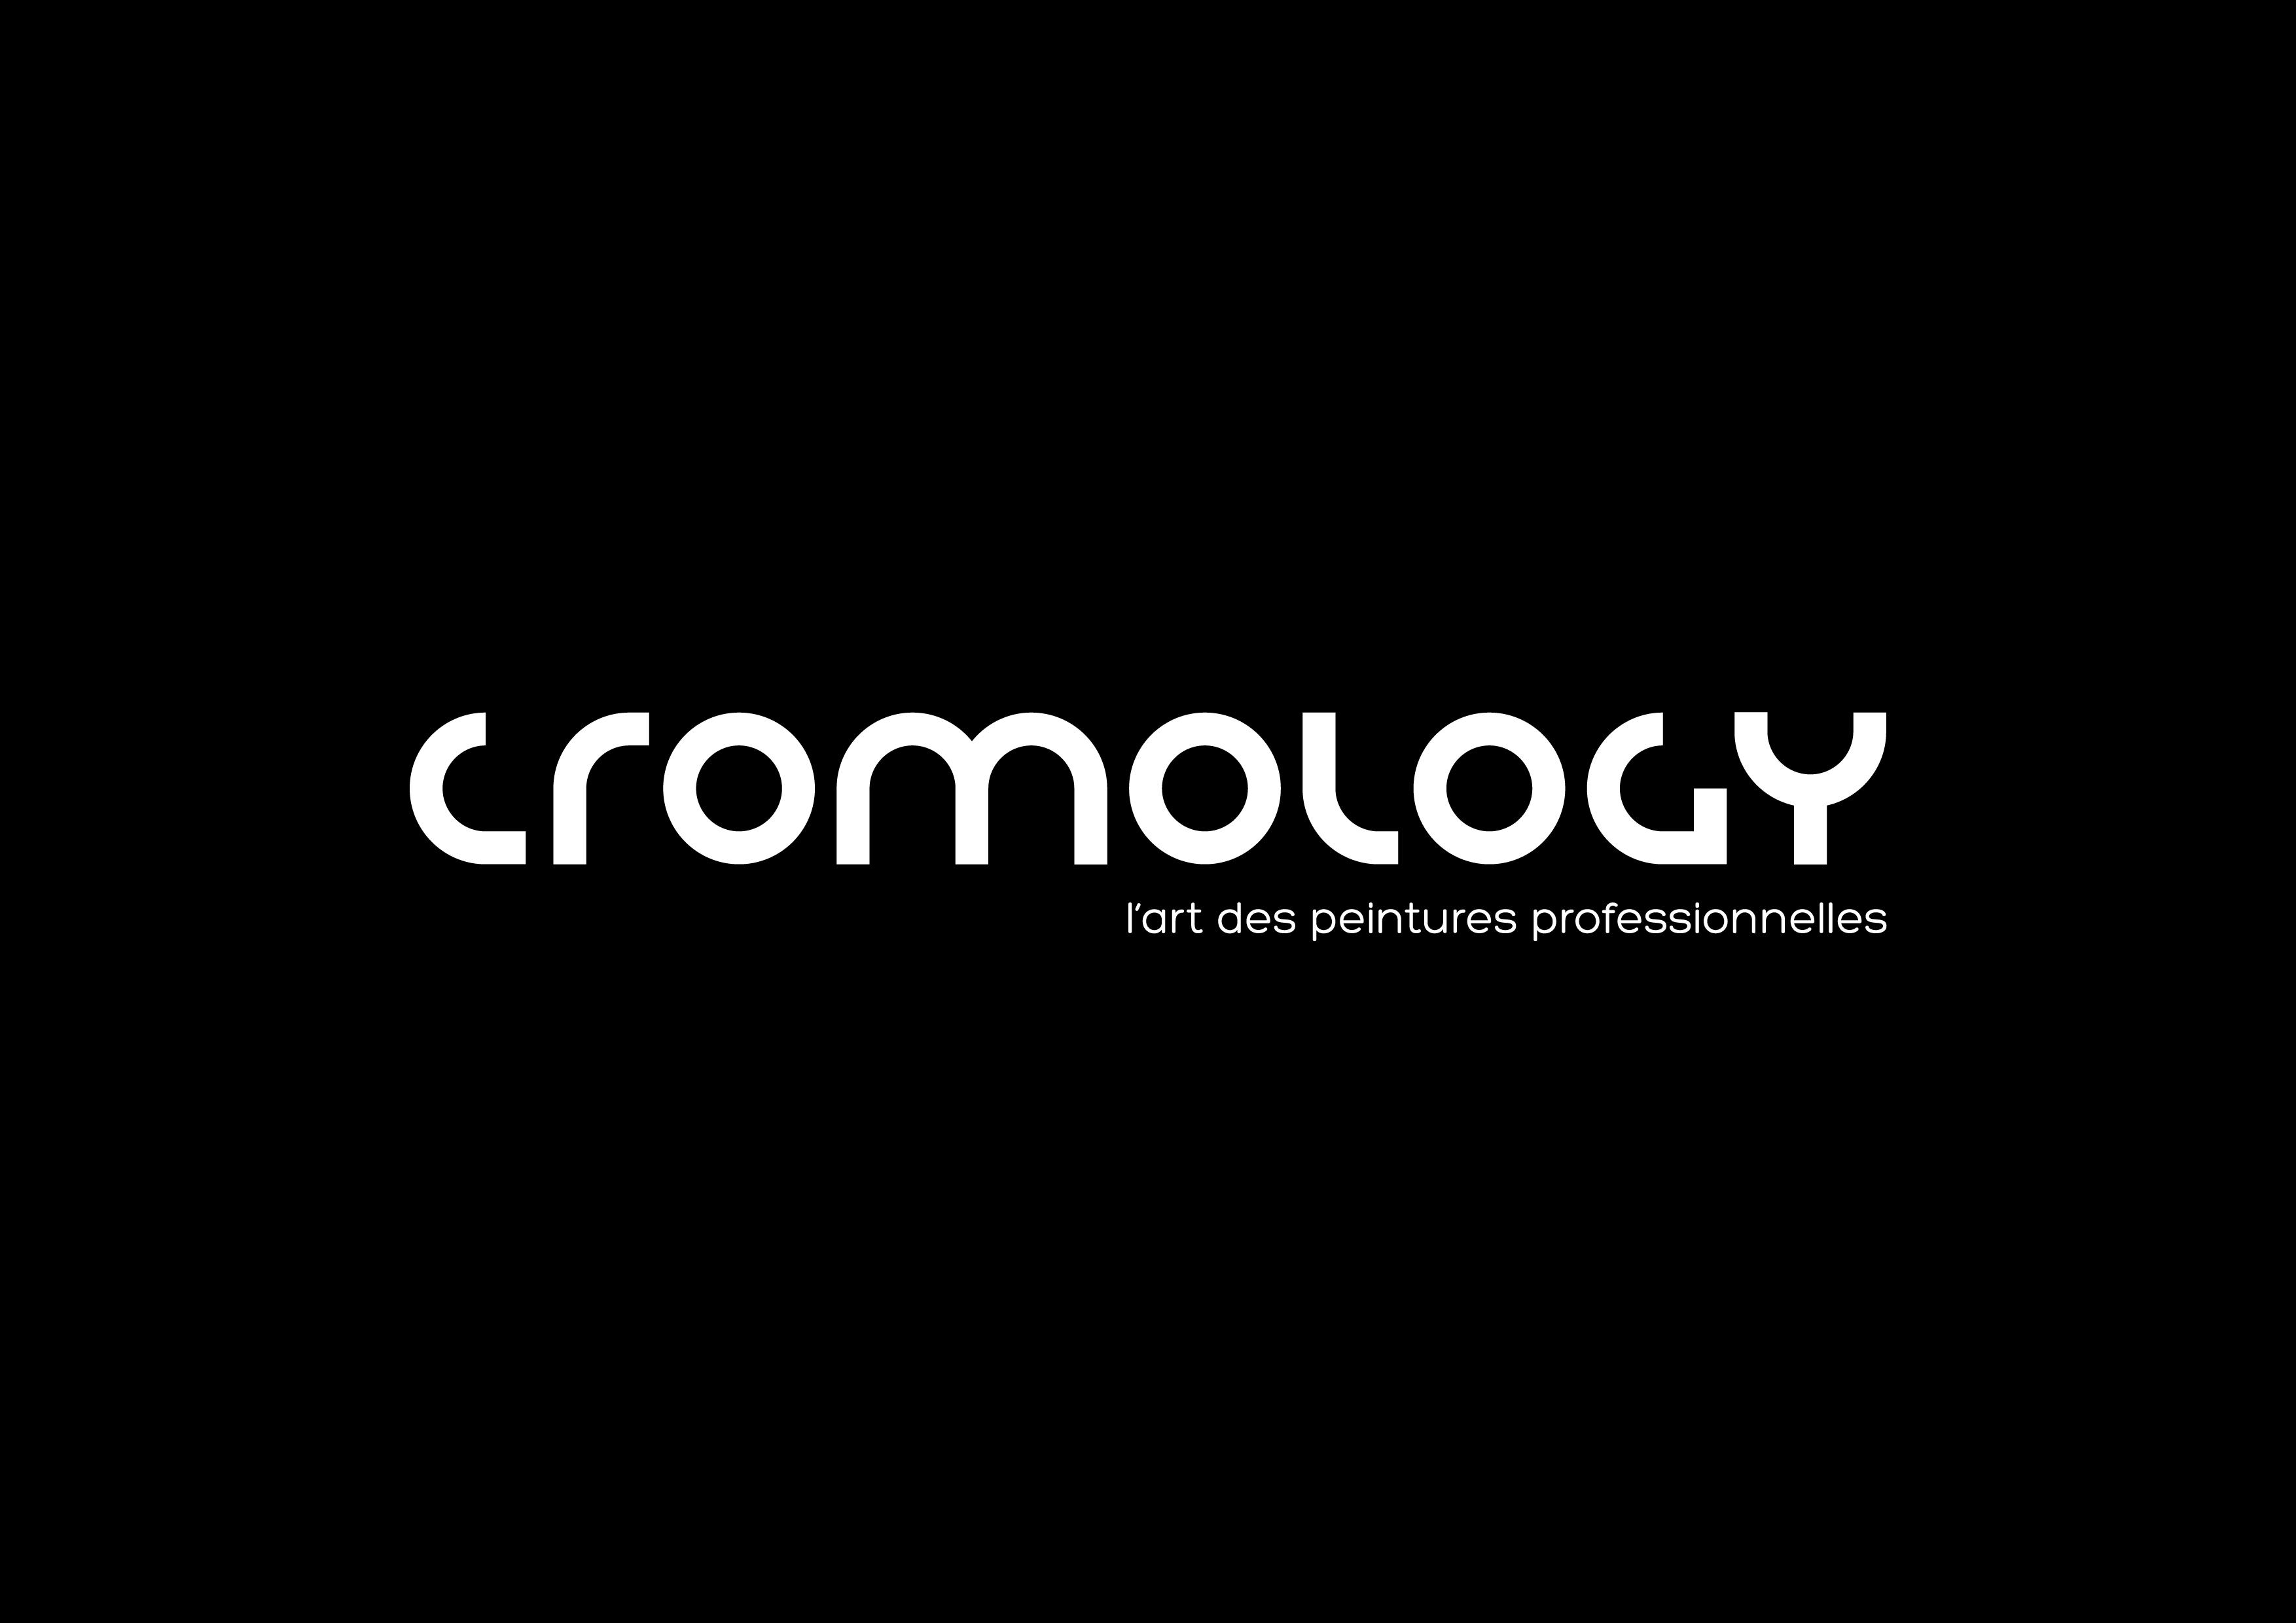 Cromology Wikipédia